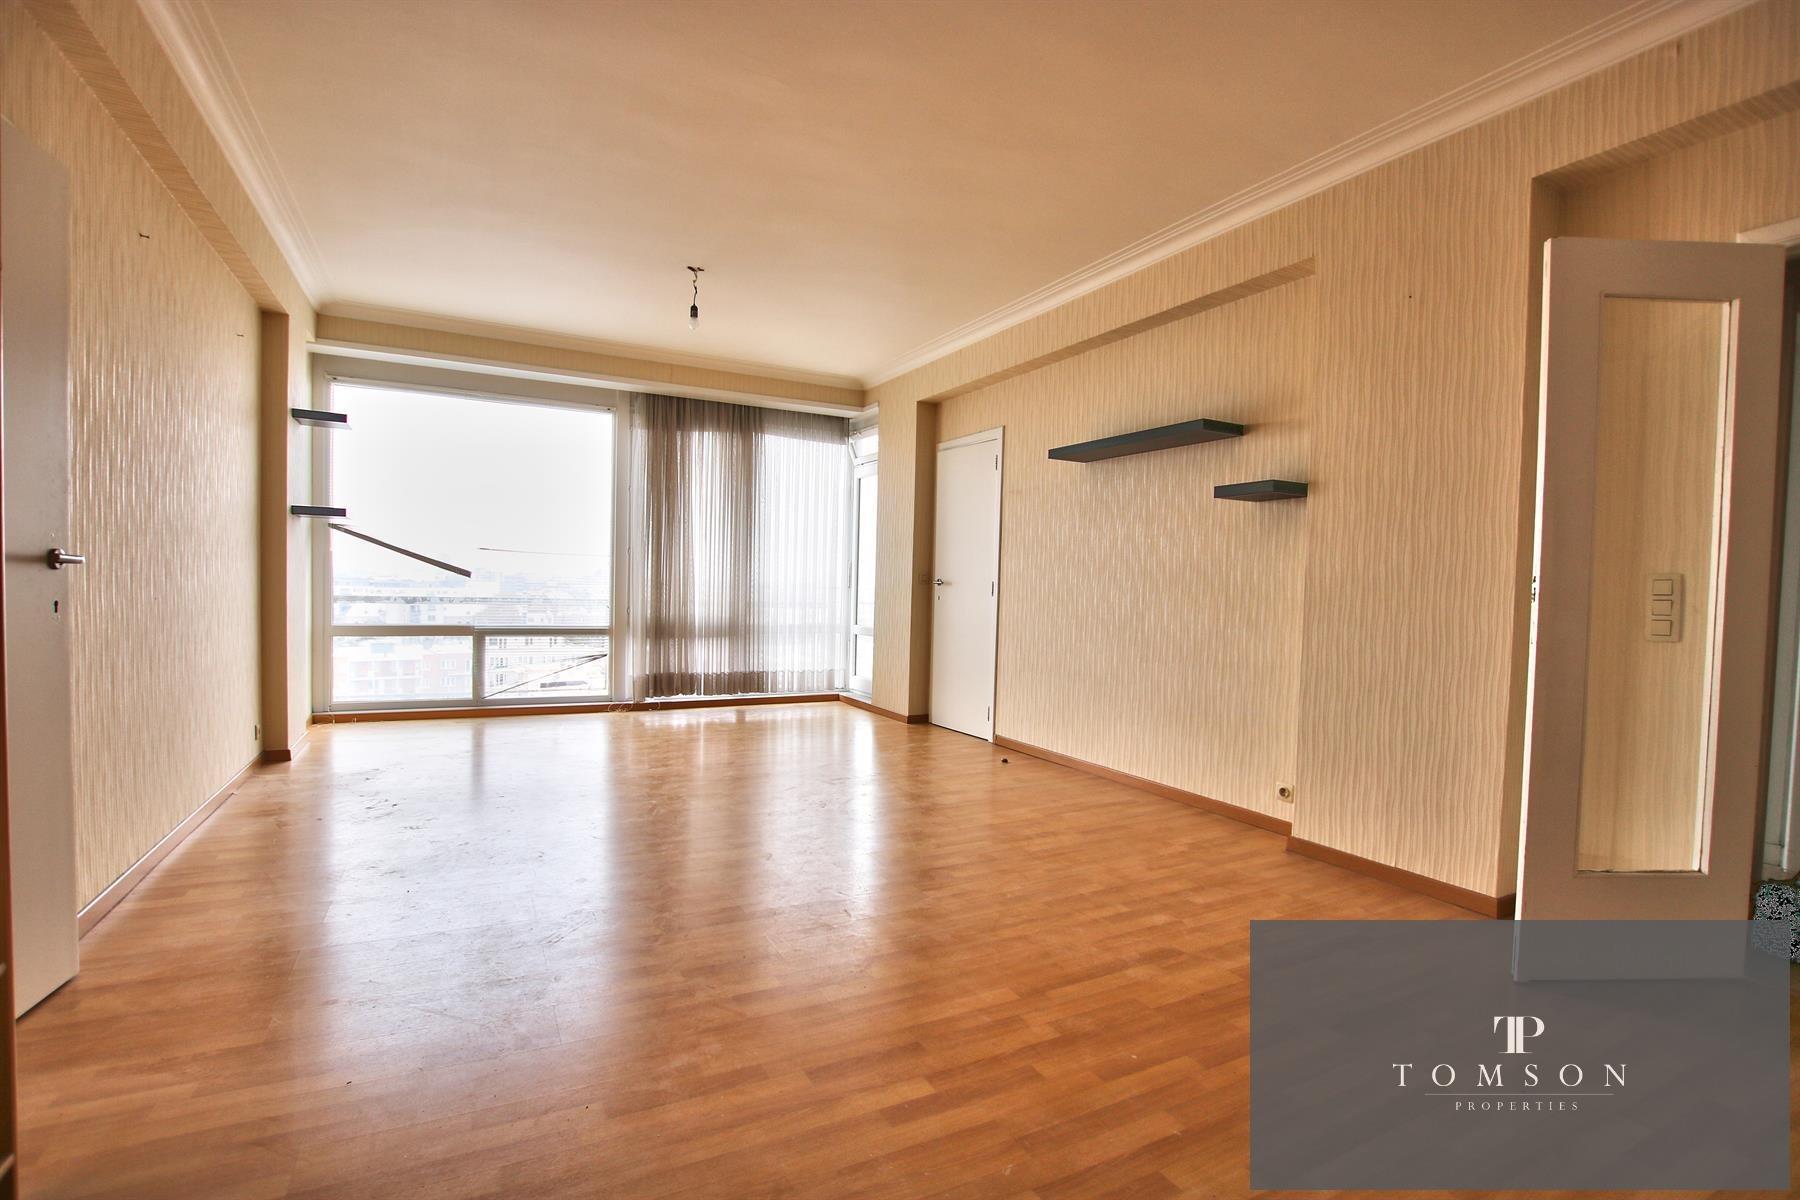 Flat - Auderghem - #4296625-2